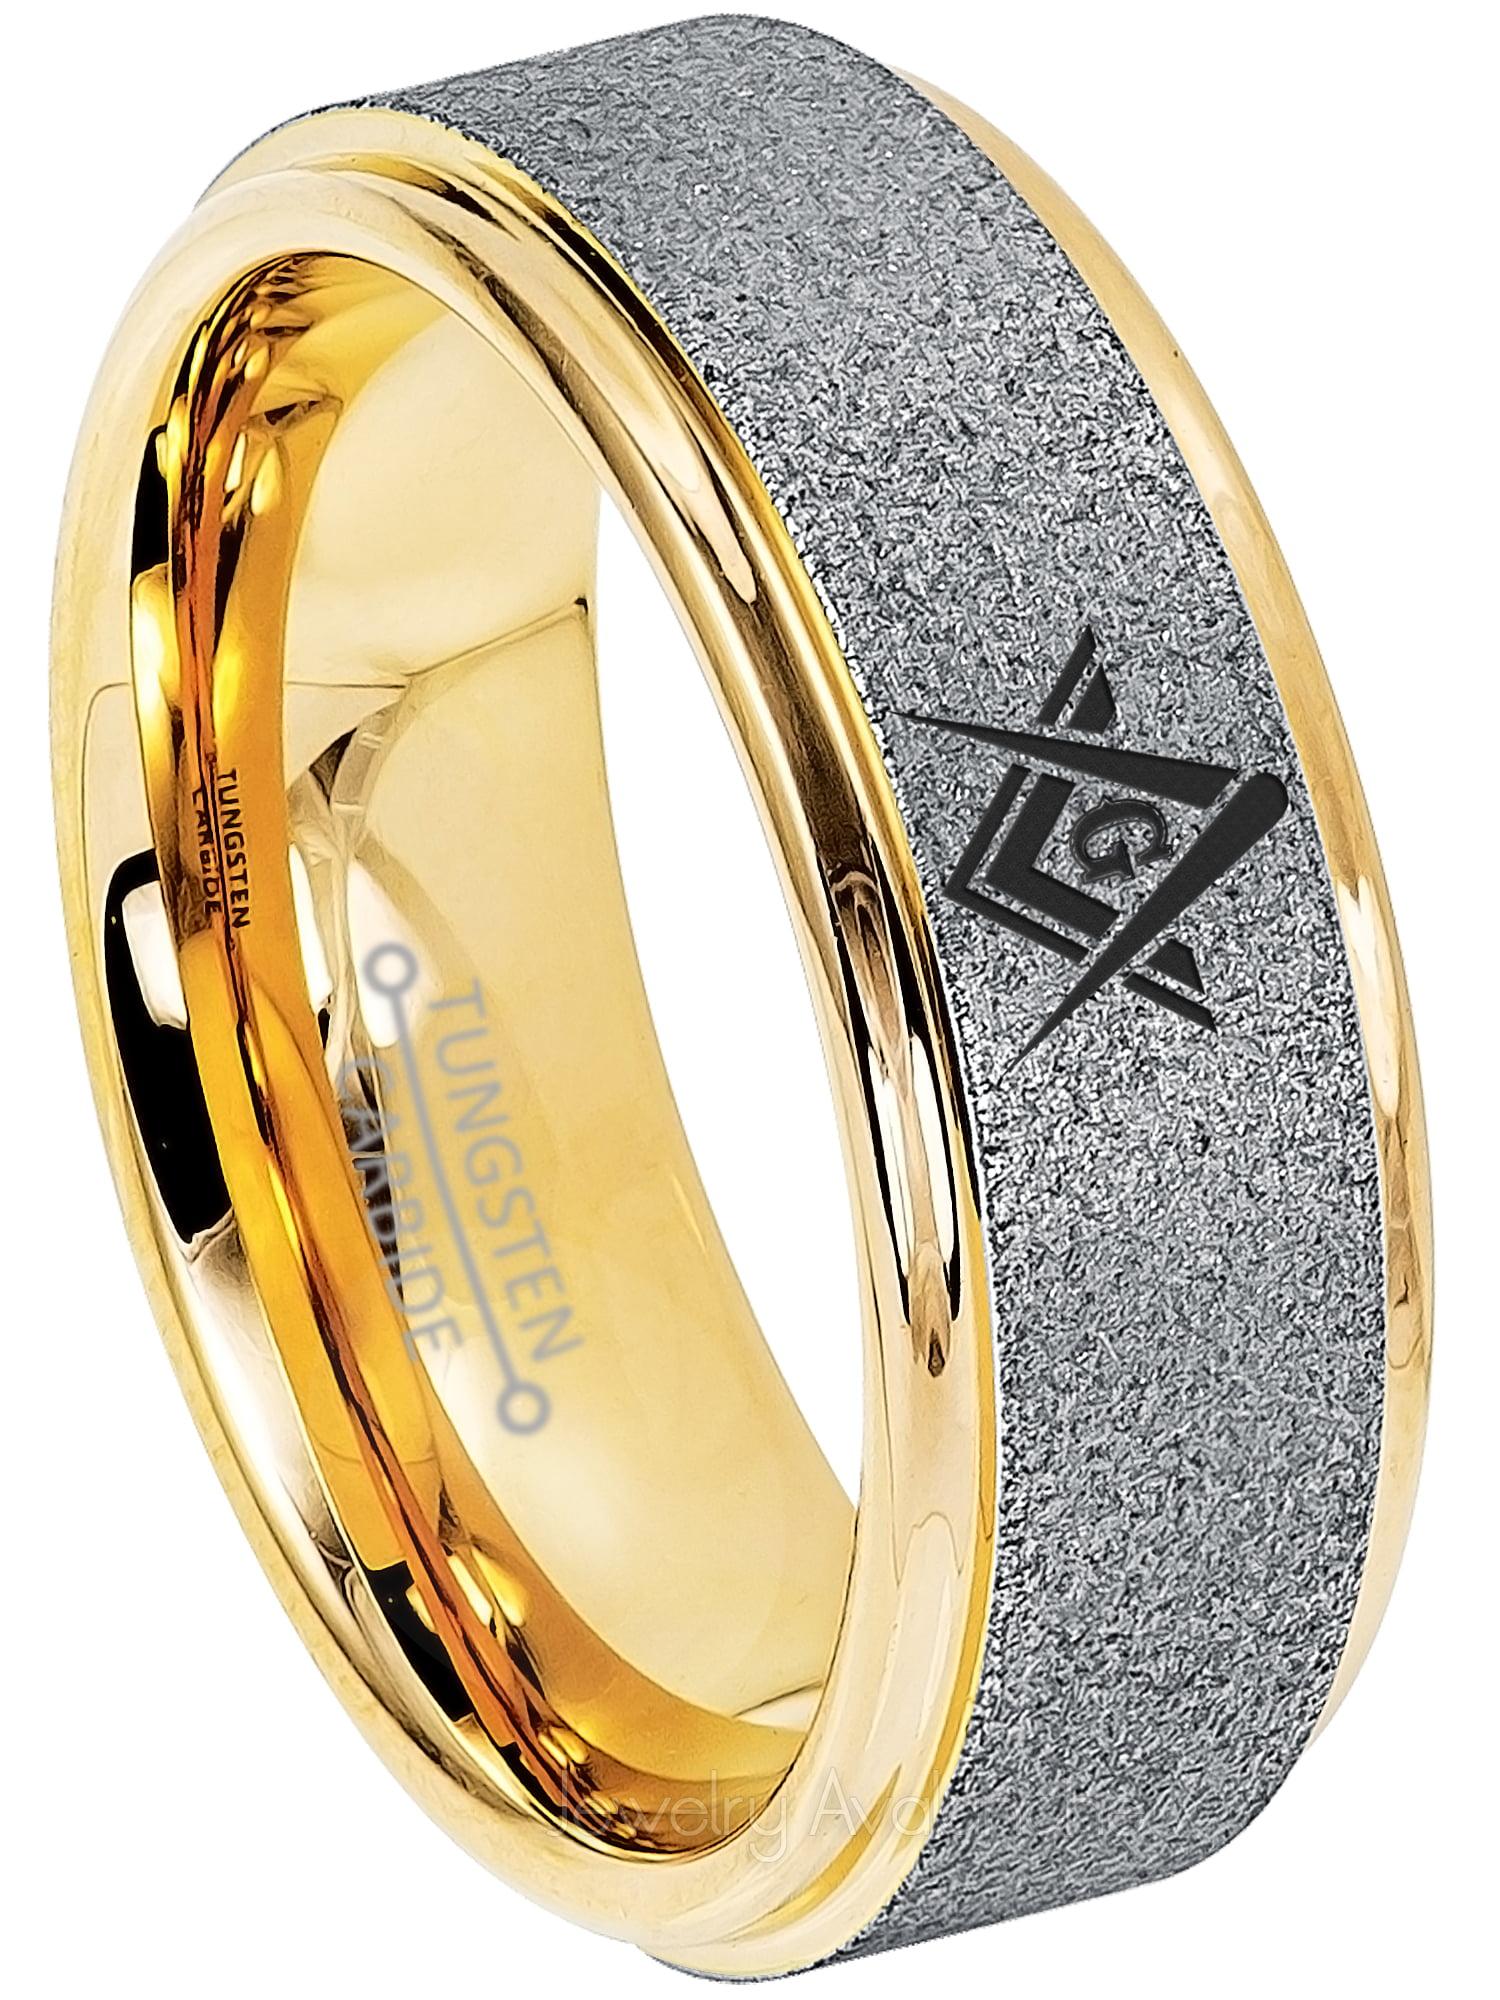 Details about  /Masonic Ring 2-Tone Blue Tungsten Carbide Ring Freemason Tungsten Wedding Band